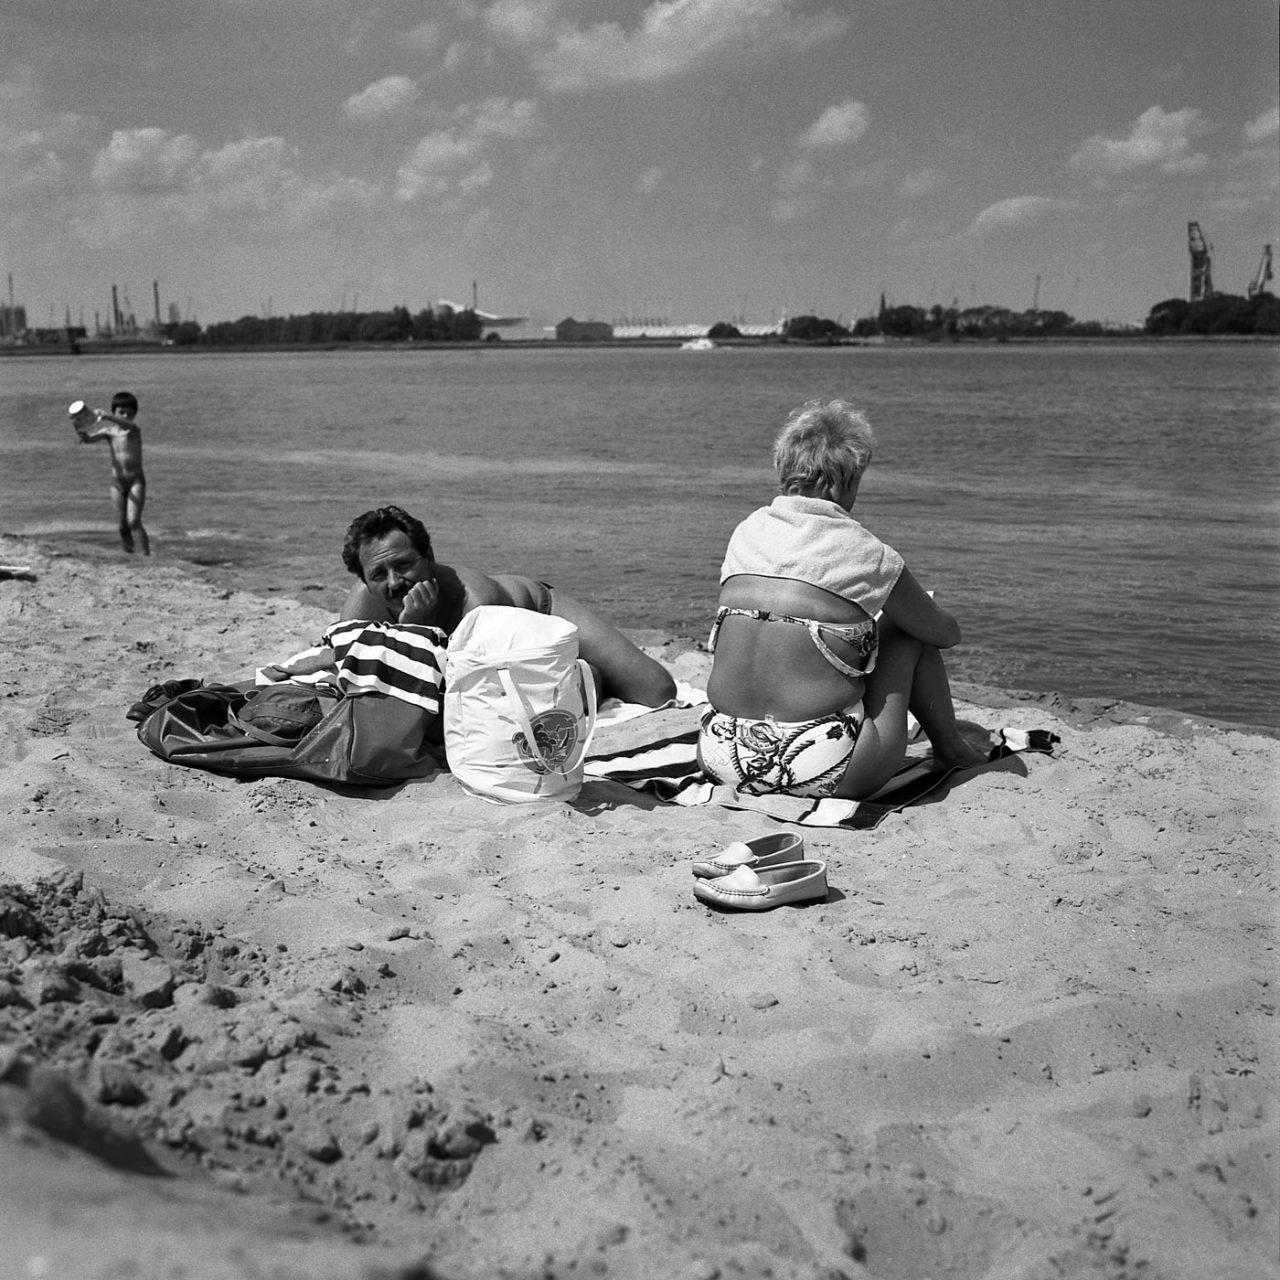 145-photography-sandra-mermans